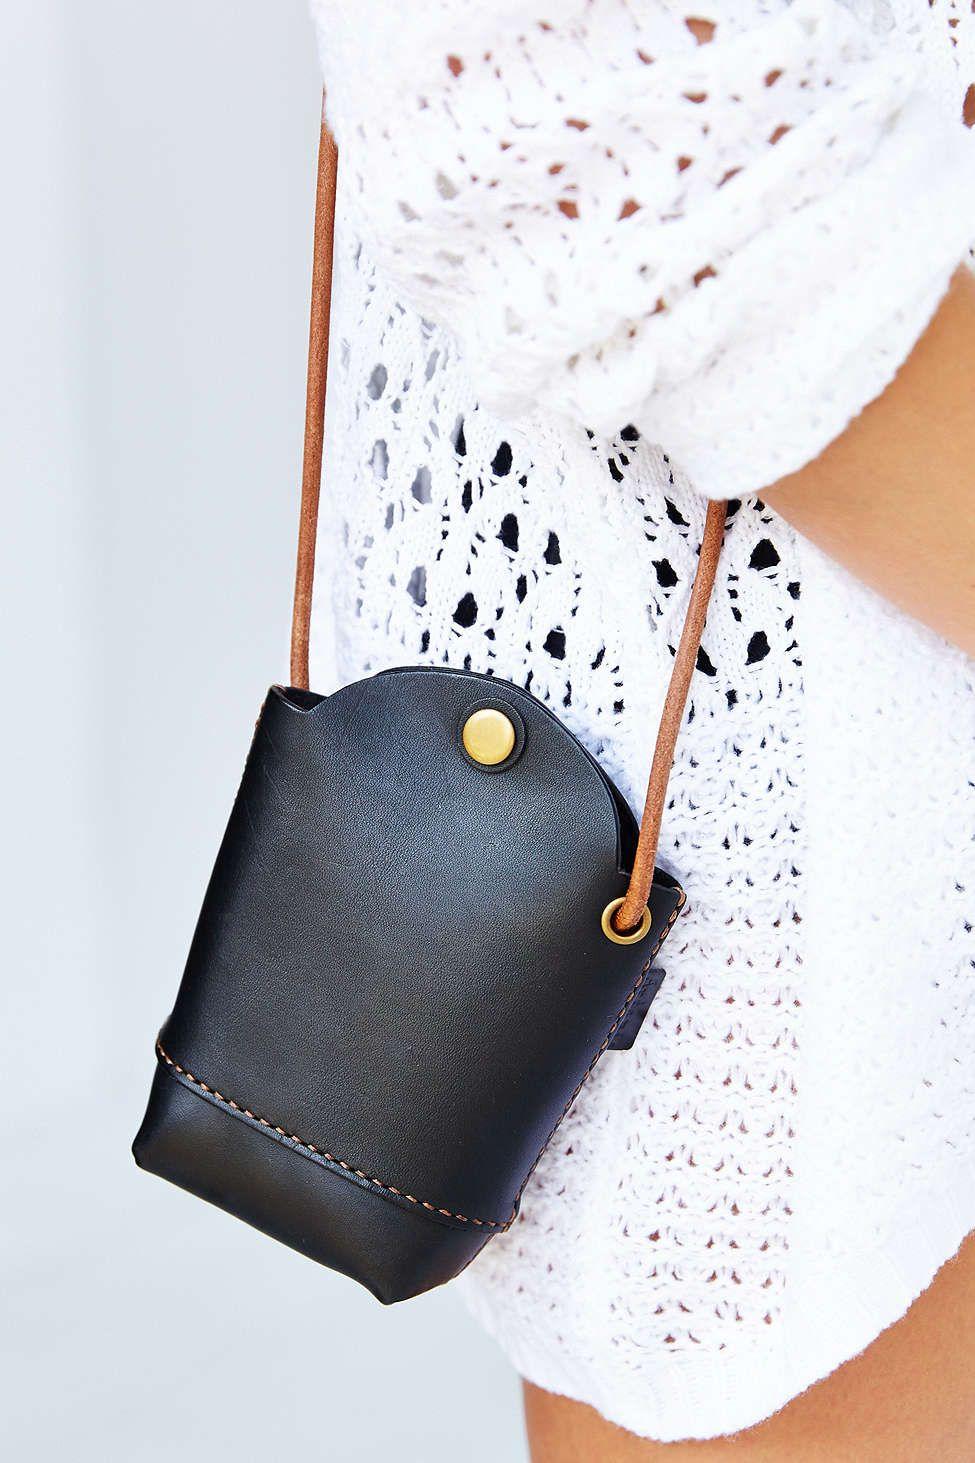 Black Artemis Leather Shoulder Pouch Handbag @ Urban Outfitters $60